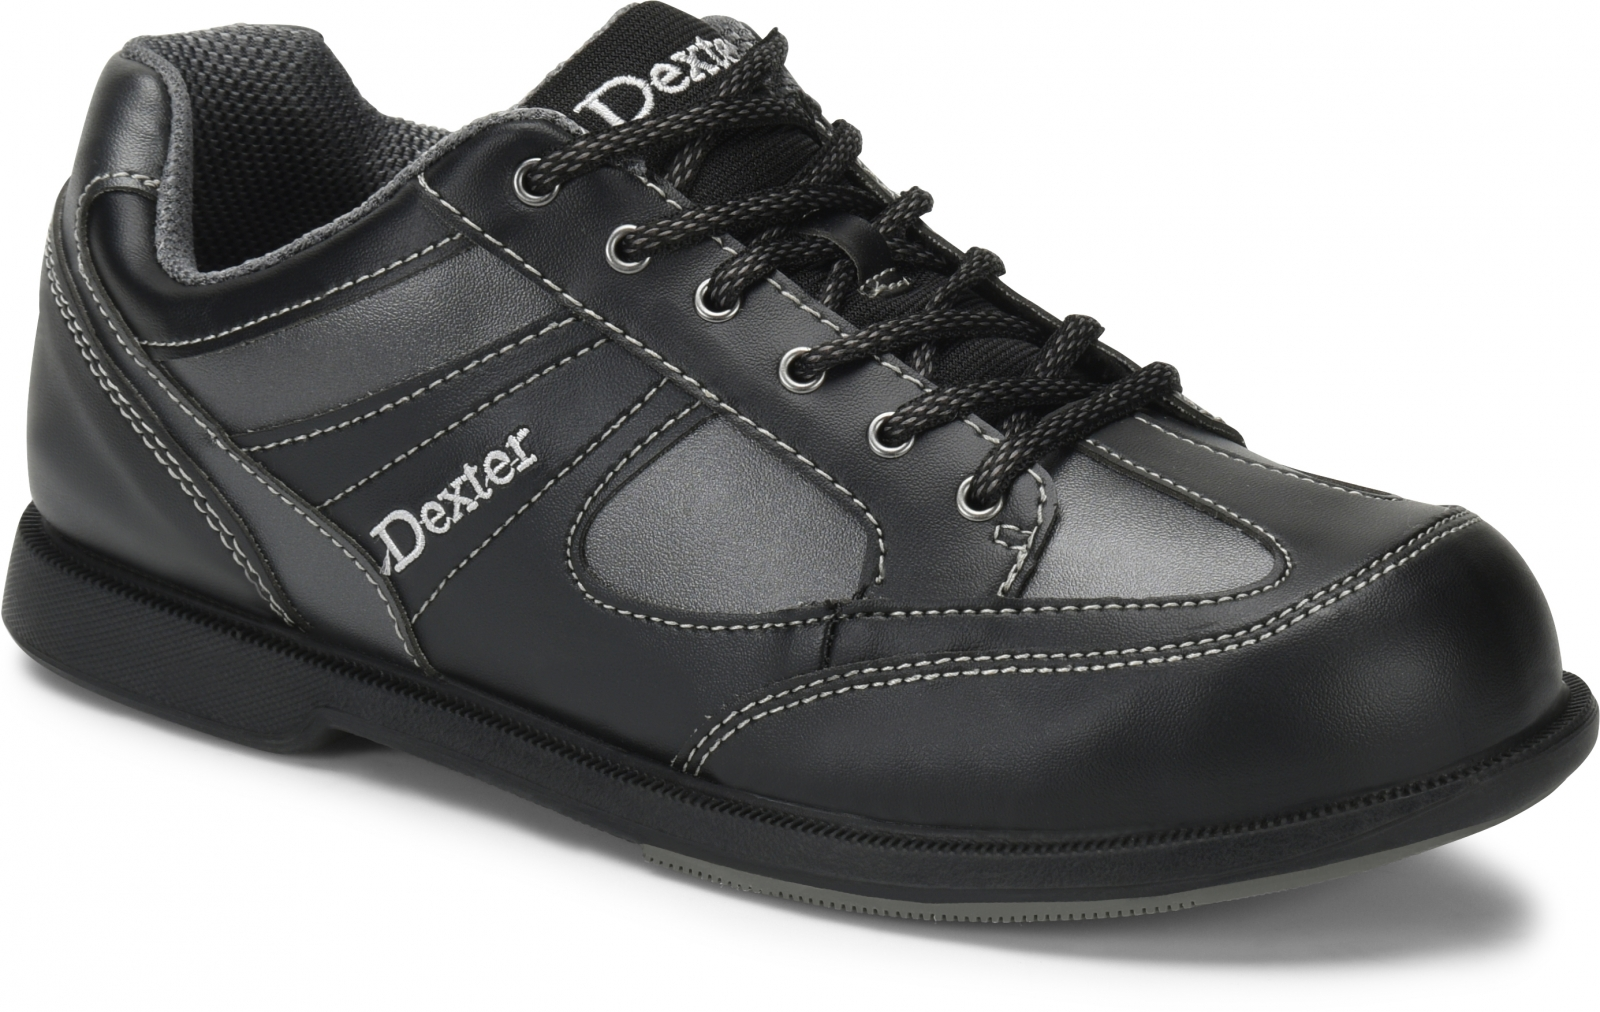 Dexter DexLite Pro Match Play RH - Bowlingschuhe für Herren Schwarz//Grau